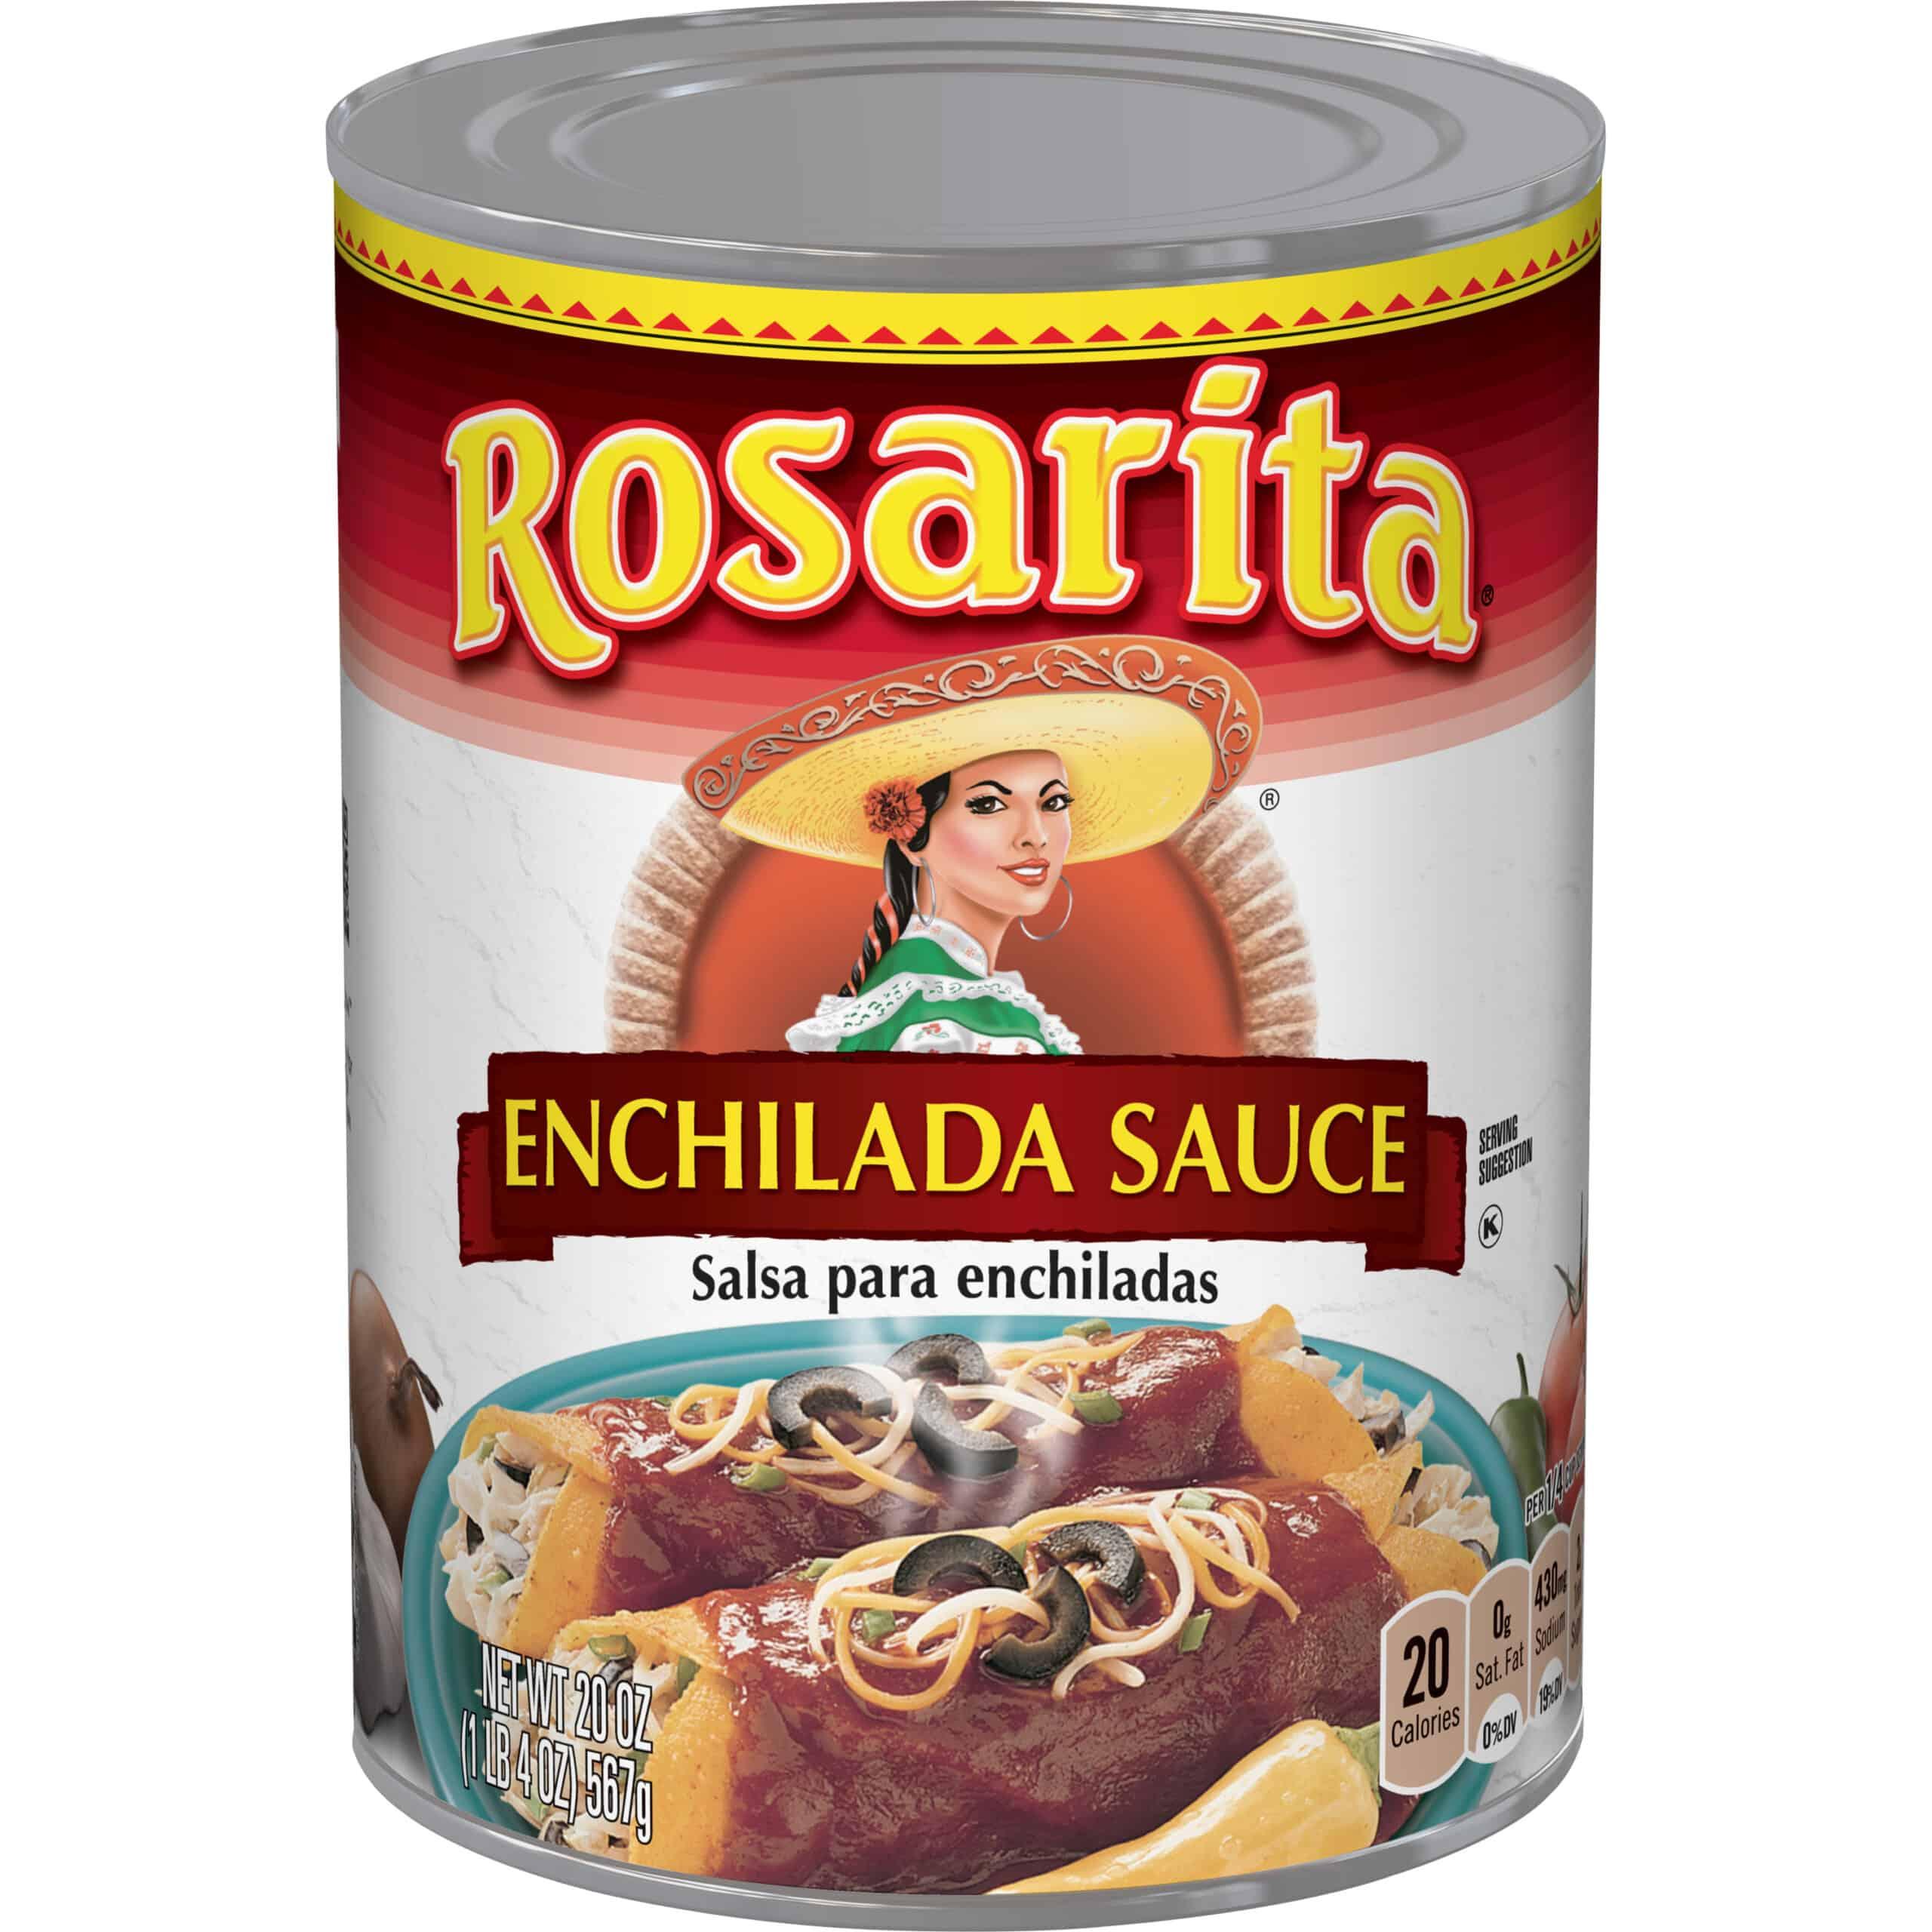 Rosarita Enchilada Sauce 20 oz - Walmart.com